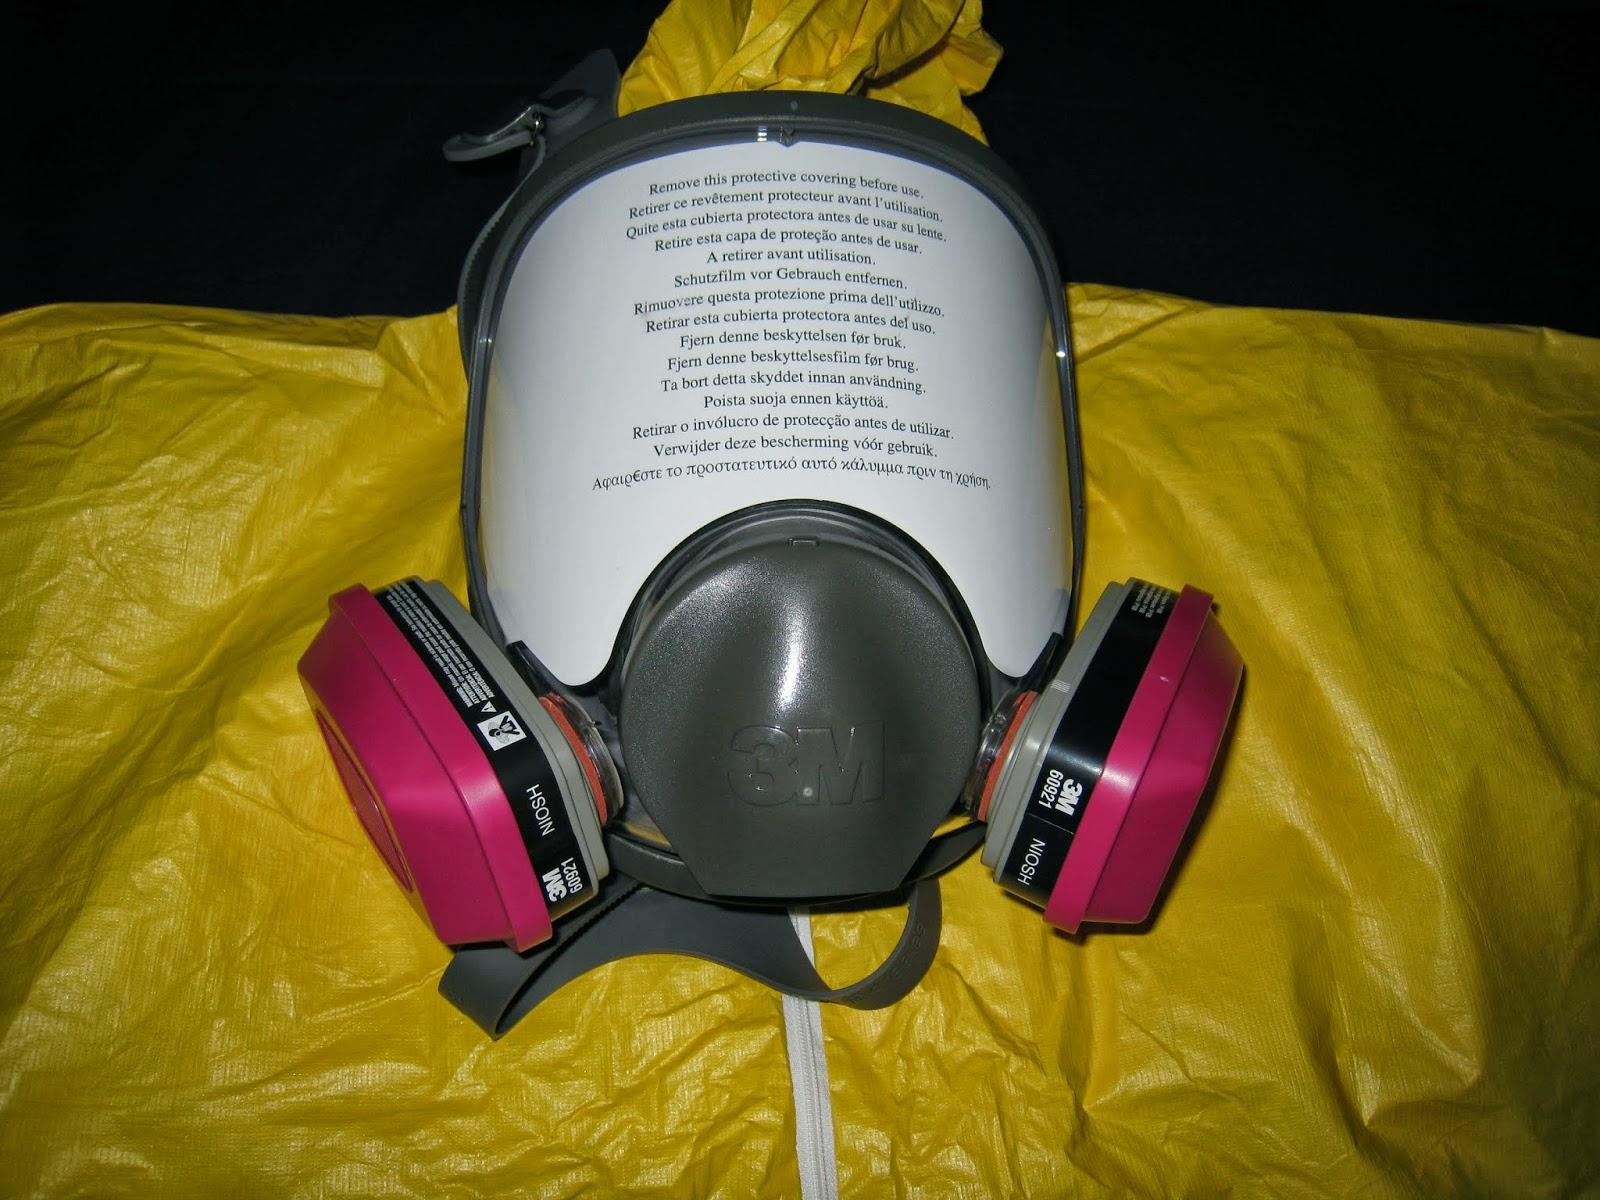 NWK to MIA: My Breaking Bad Walter White Heisenberg Halloween ...